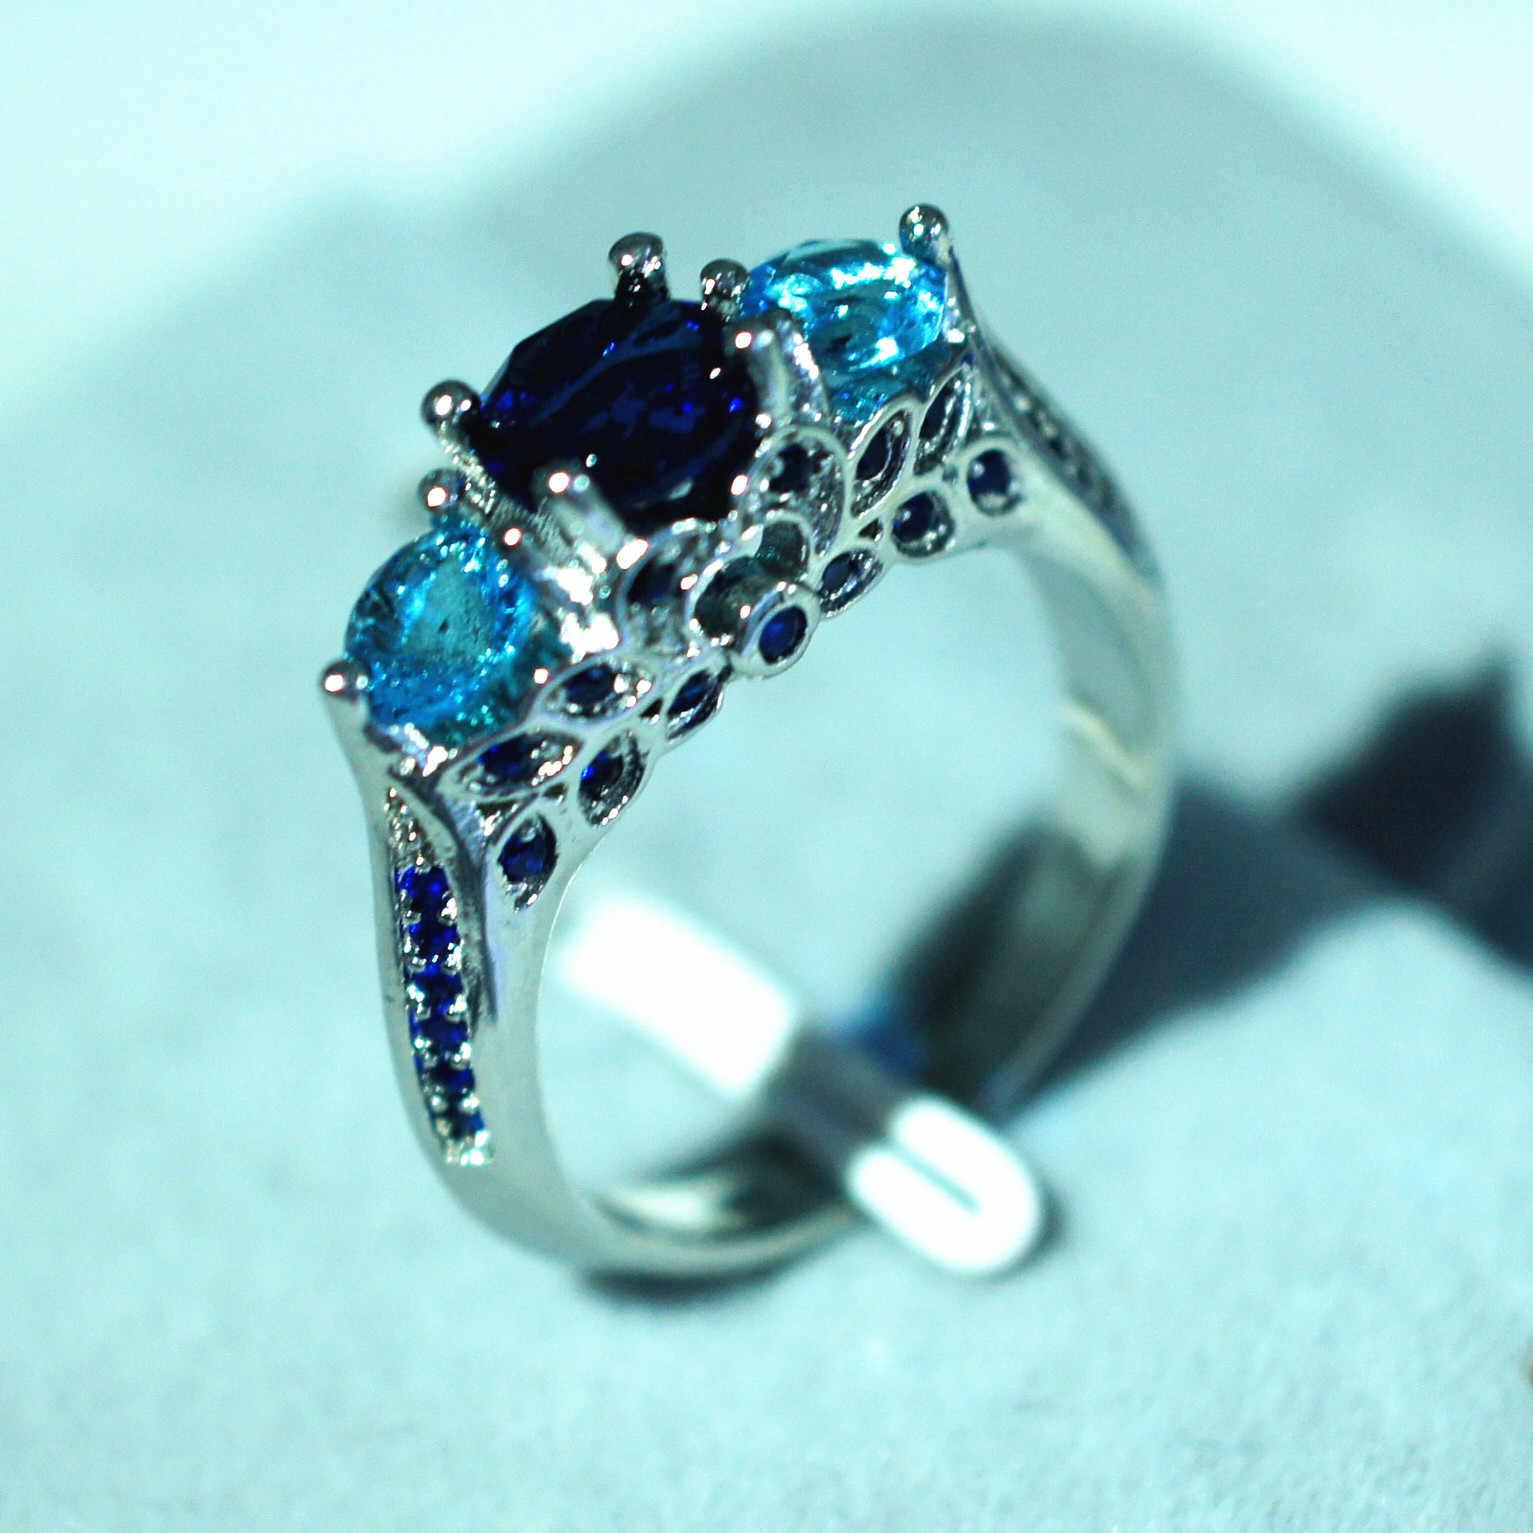 Blue Sapphire Anillo De Ring with Diamonds for Women Bizuteria of Bague or Jaune Amethyst Diamante Obsidian Jade Ring 6 7 8 9 10